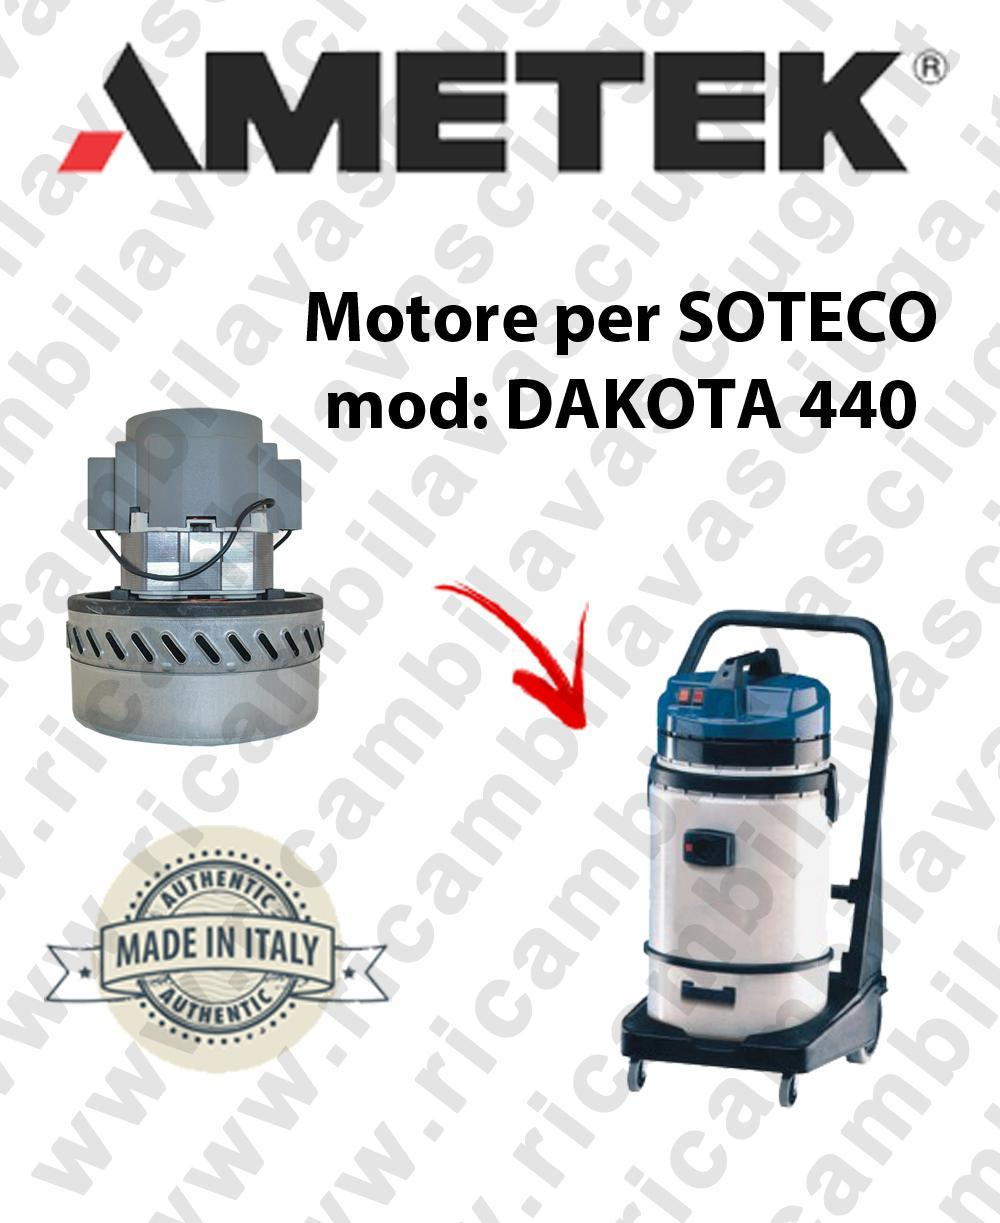 DAKOTA 440 Saugmotor AMETEK für Staubsauger SOTECO